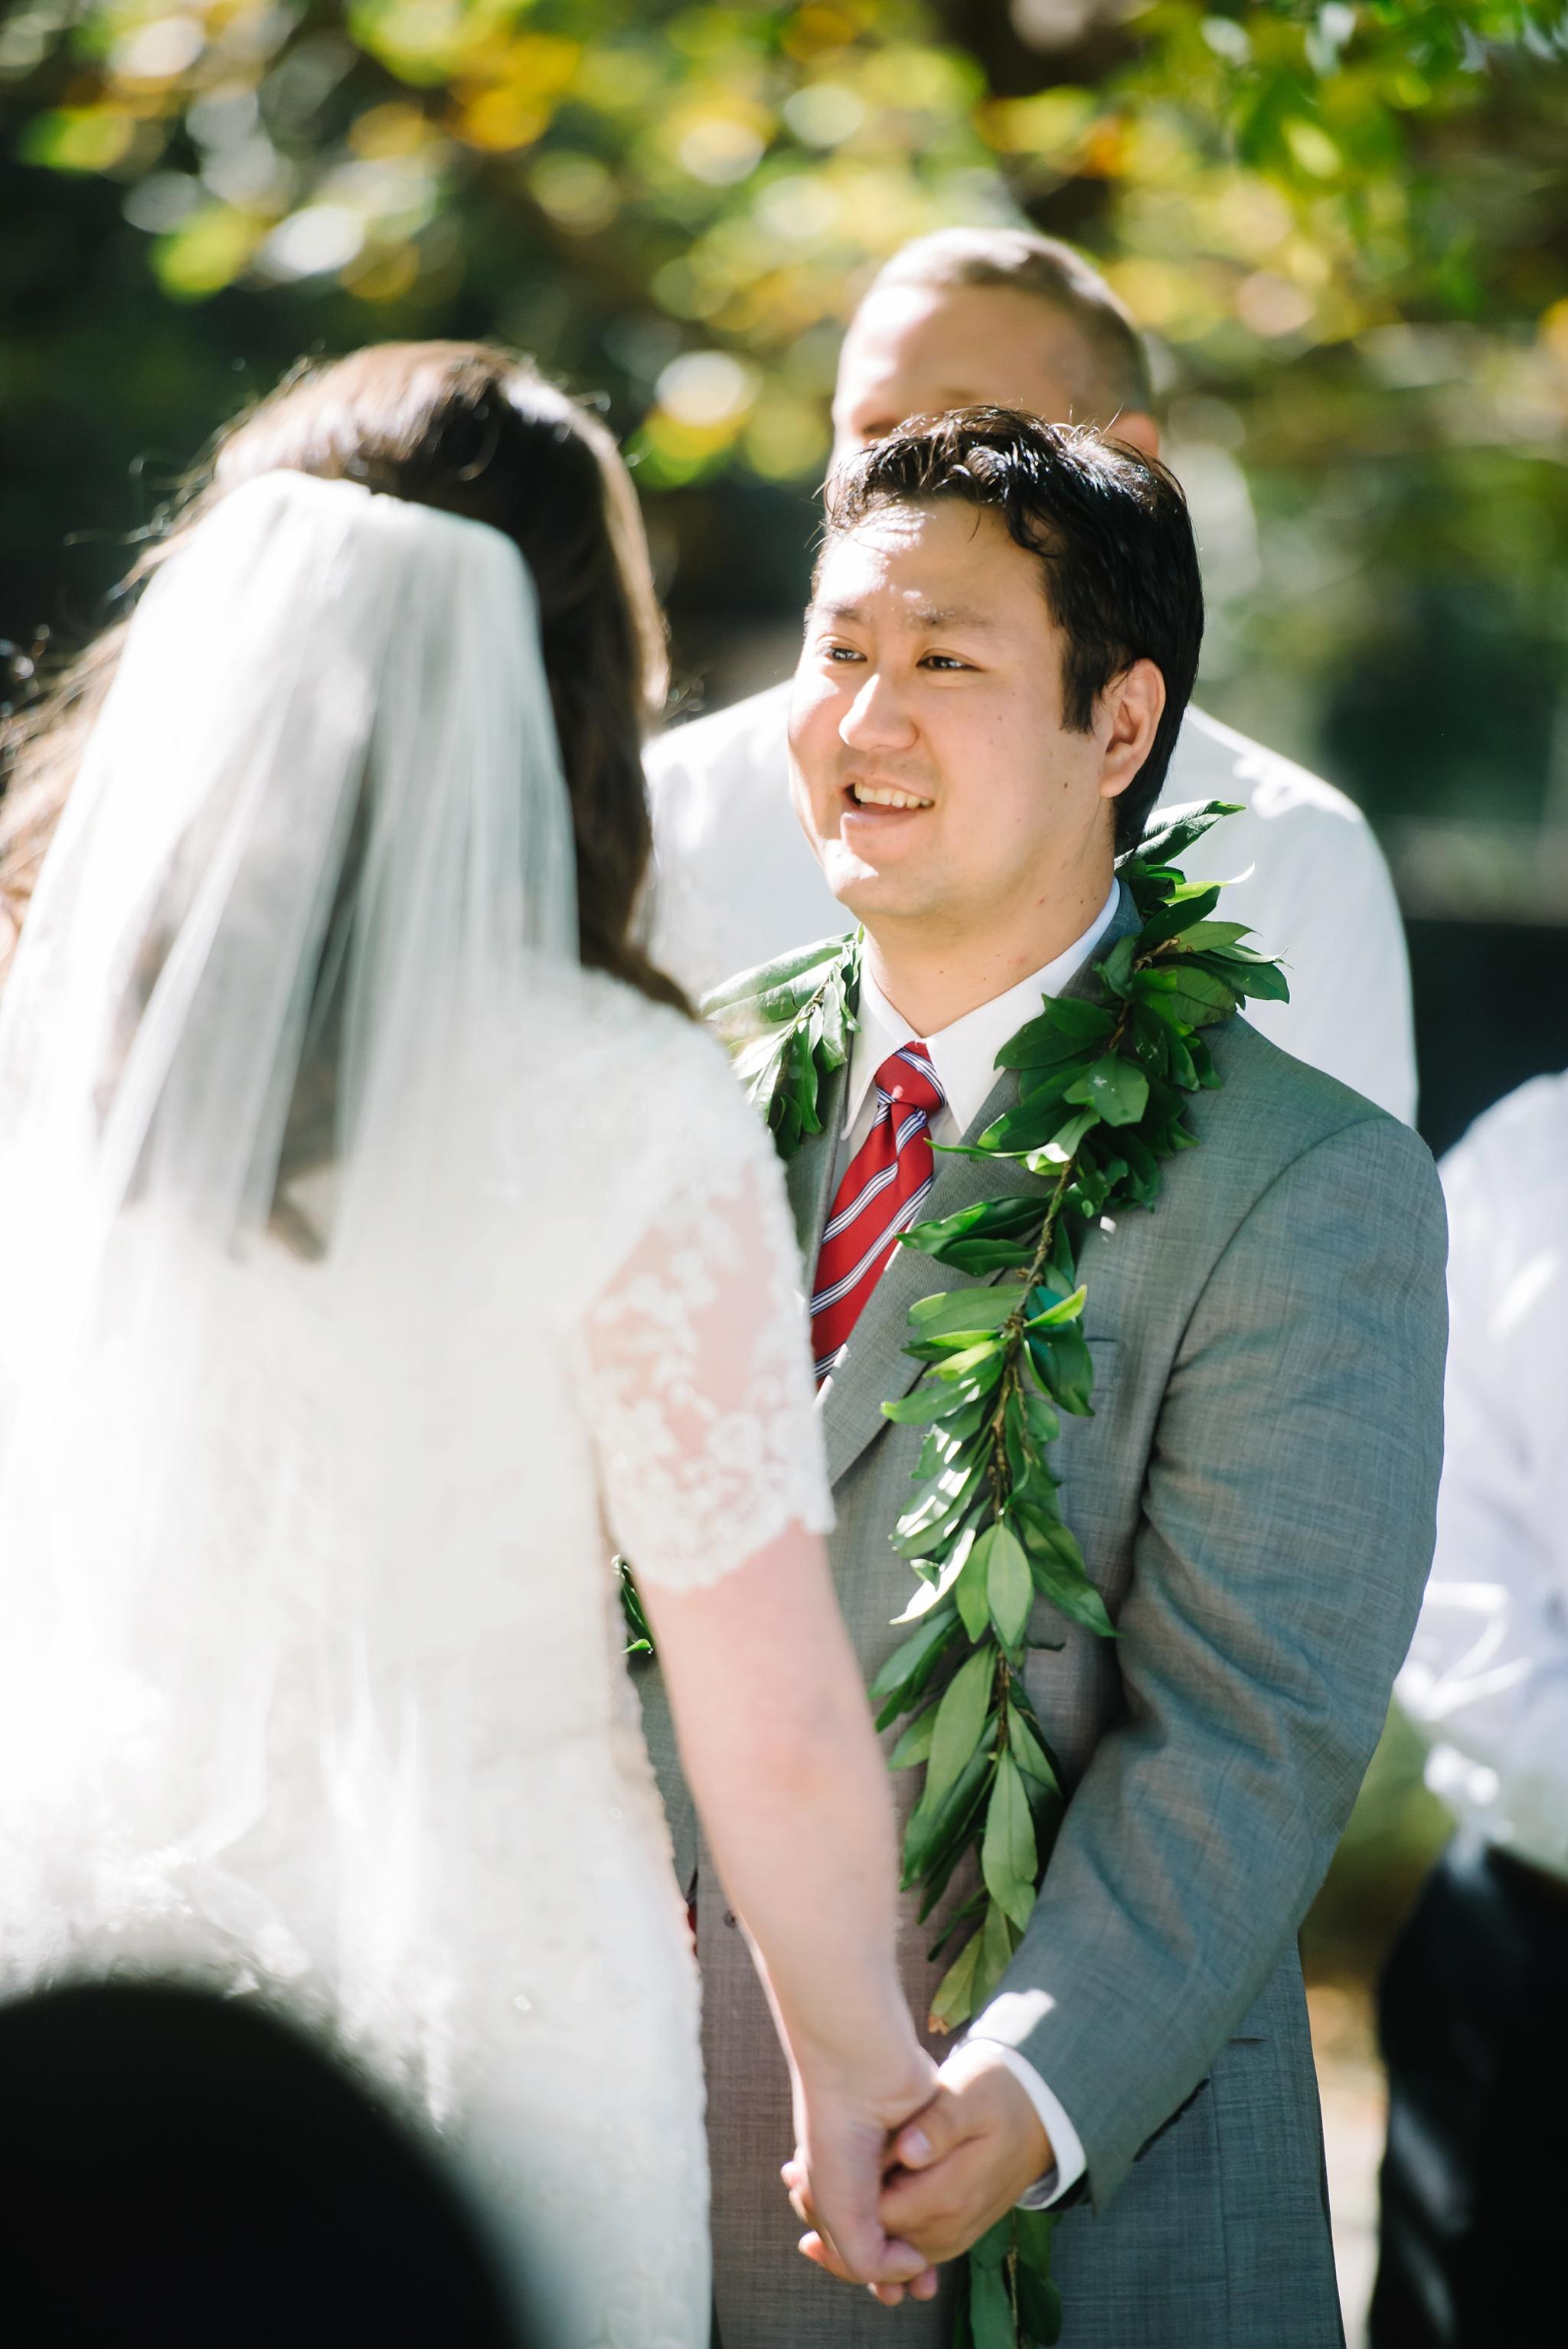 Park City Wedding Photographer Ali Sumsion 033